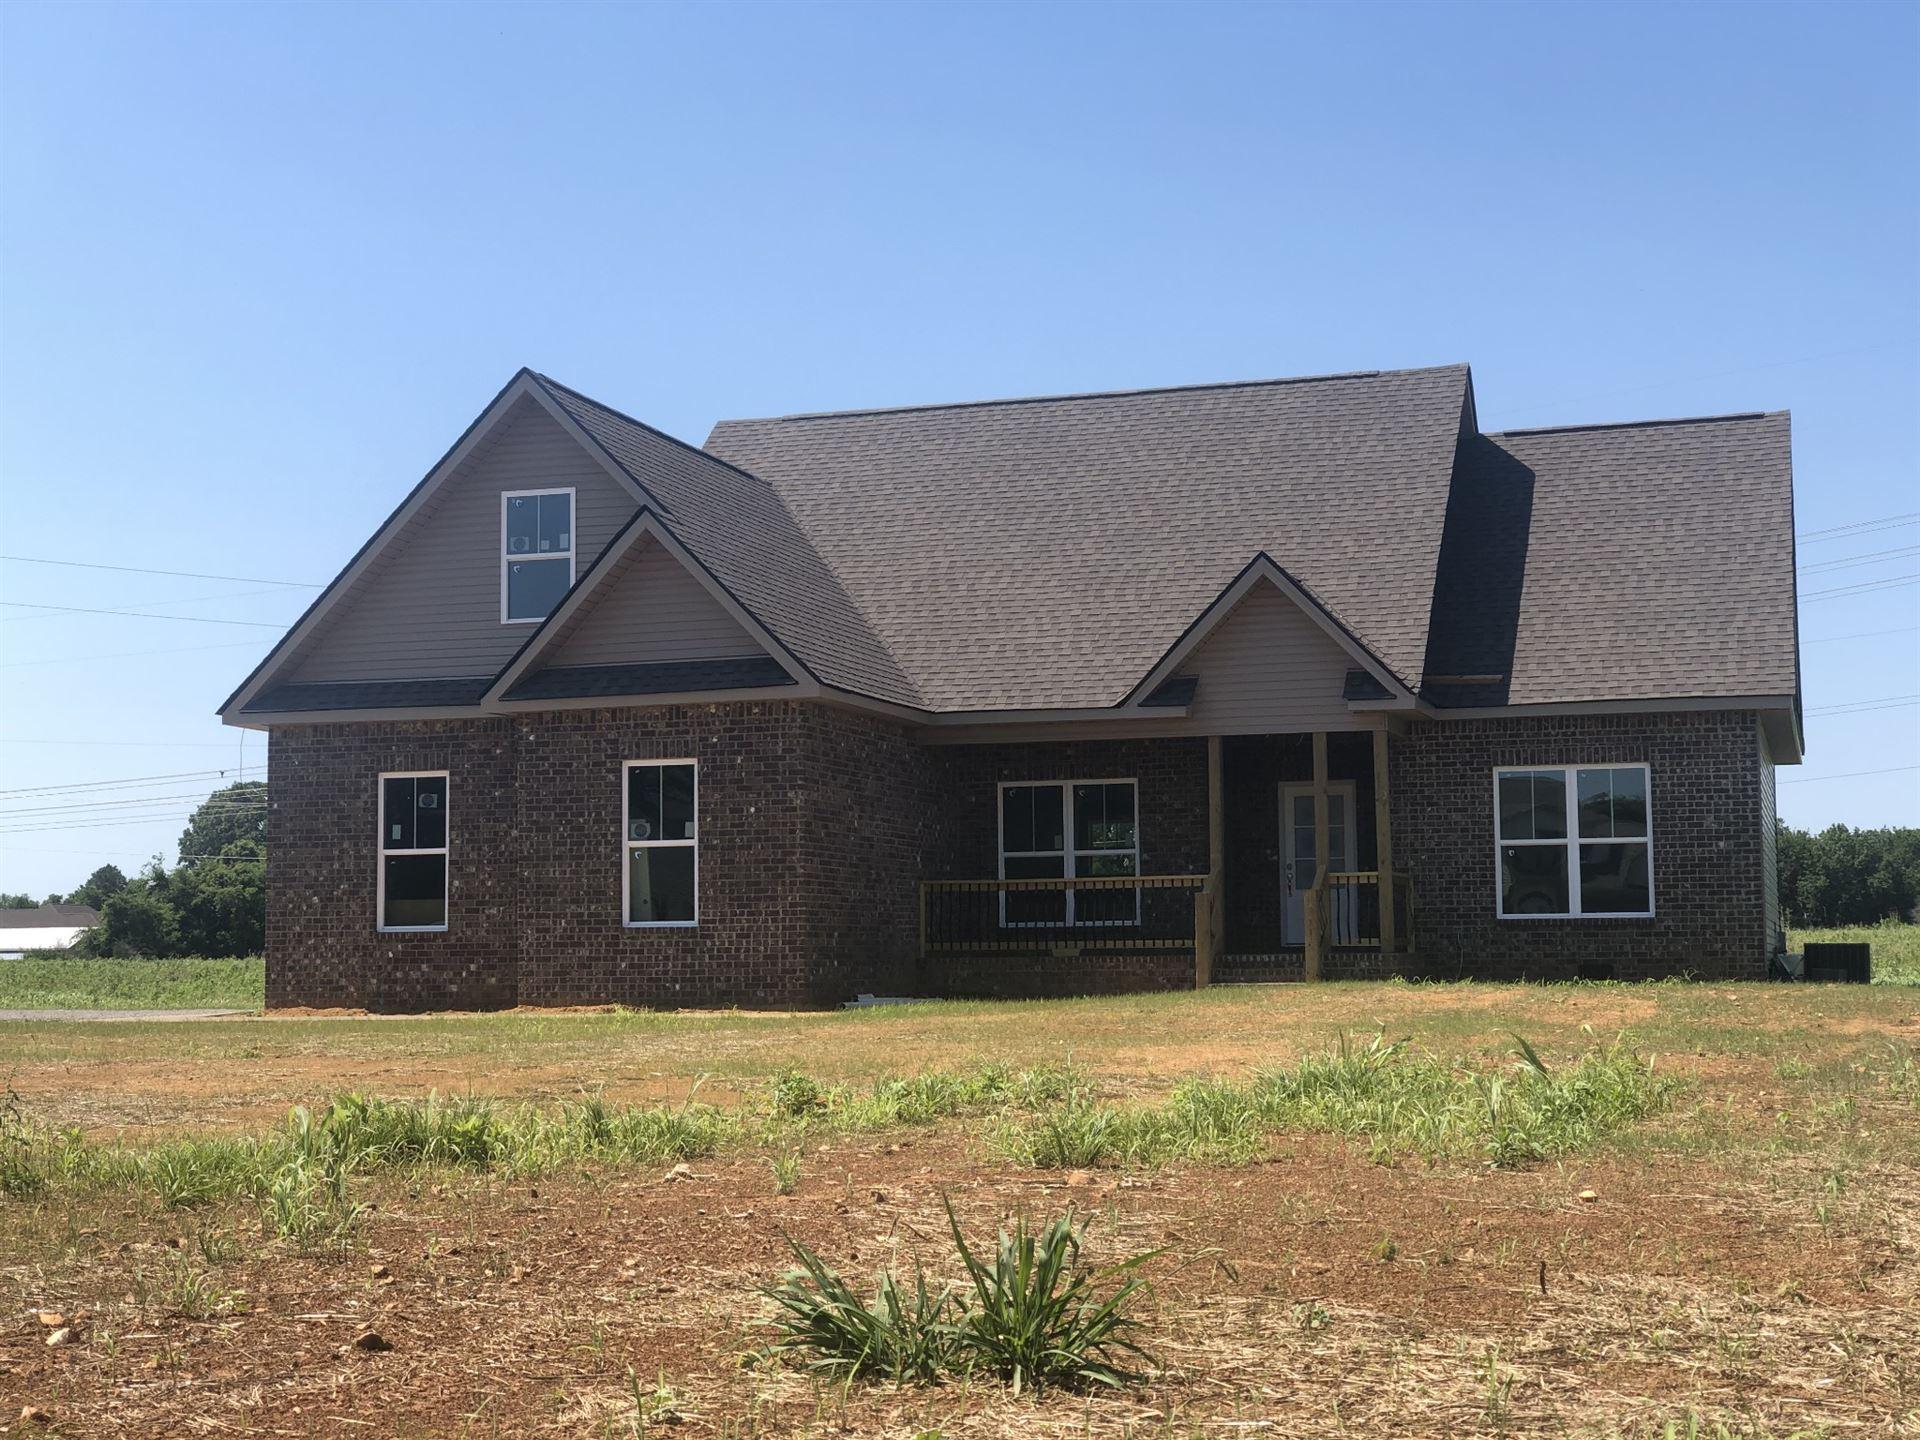 Photo of 1341 Summer Station Dr, Chapel Hill, TN 37034 (MLS # 2263488)